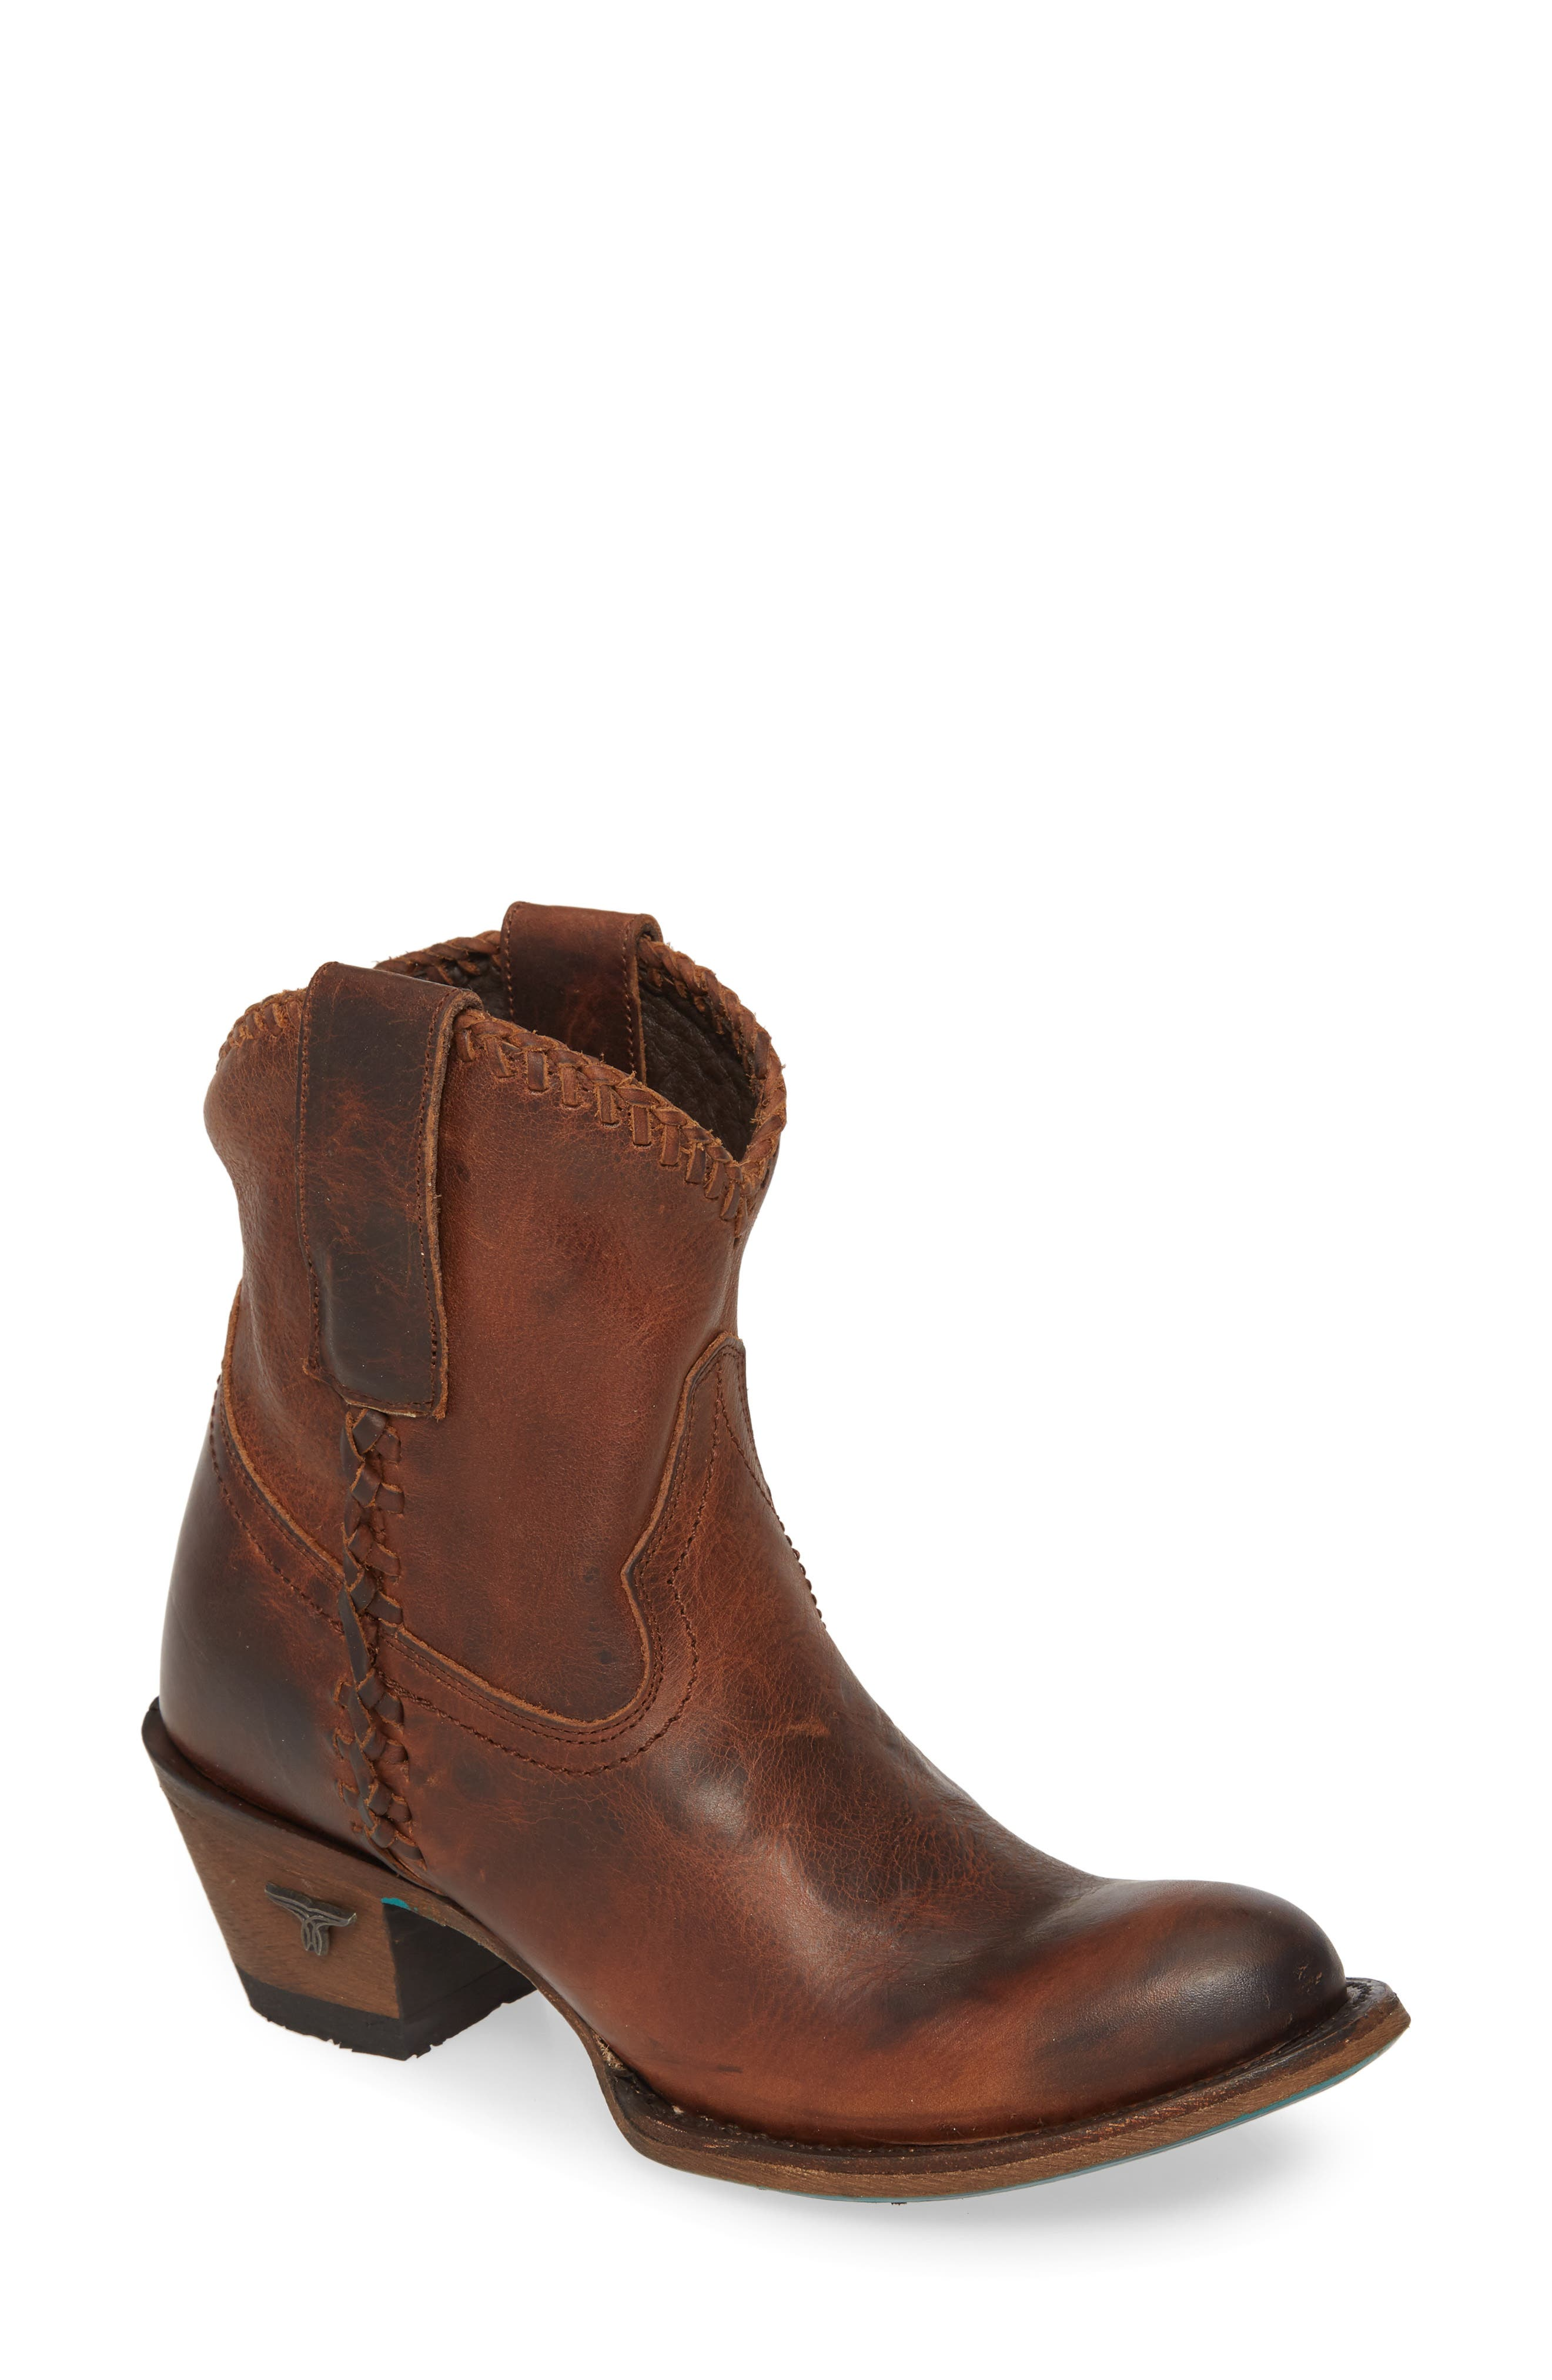 Plain Jane Western Boot